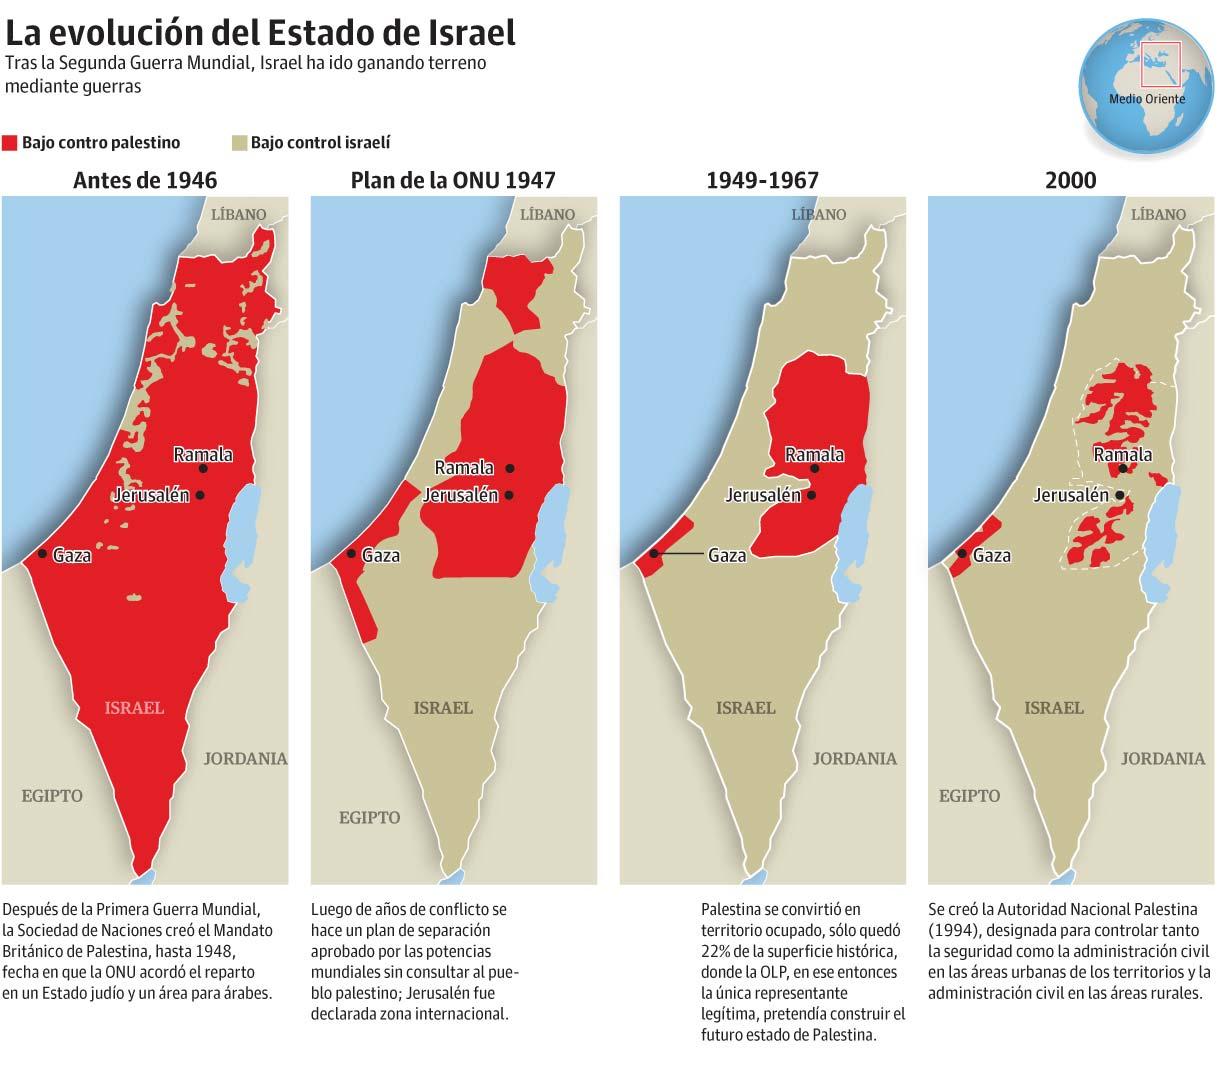 http://palestinalibre.org/upload/images/mun22291112a.jpg